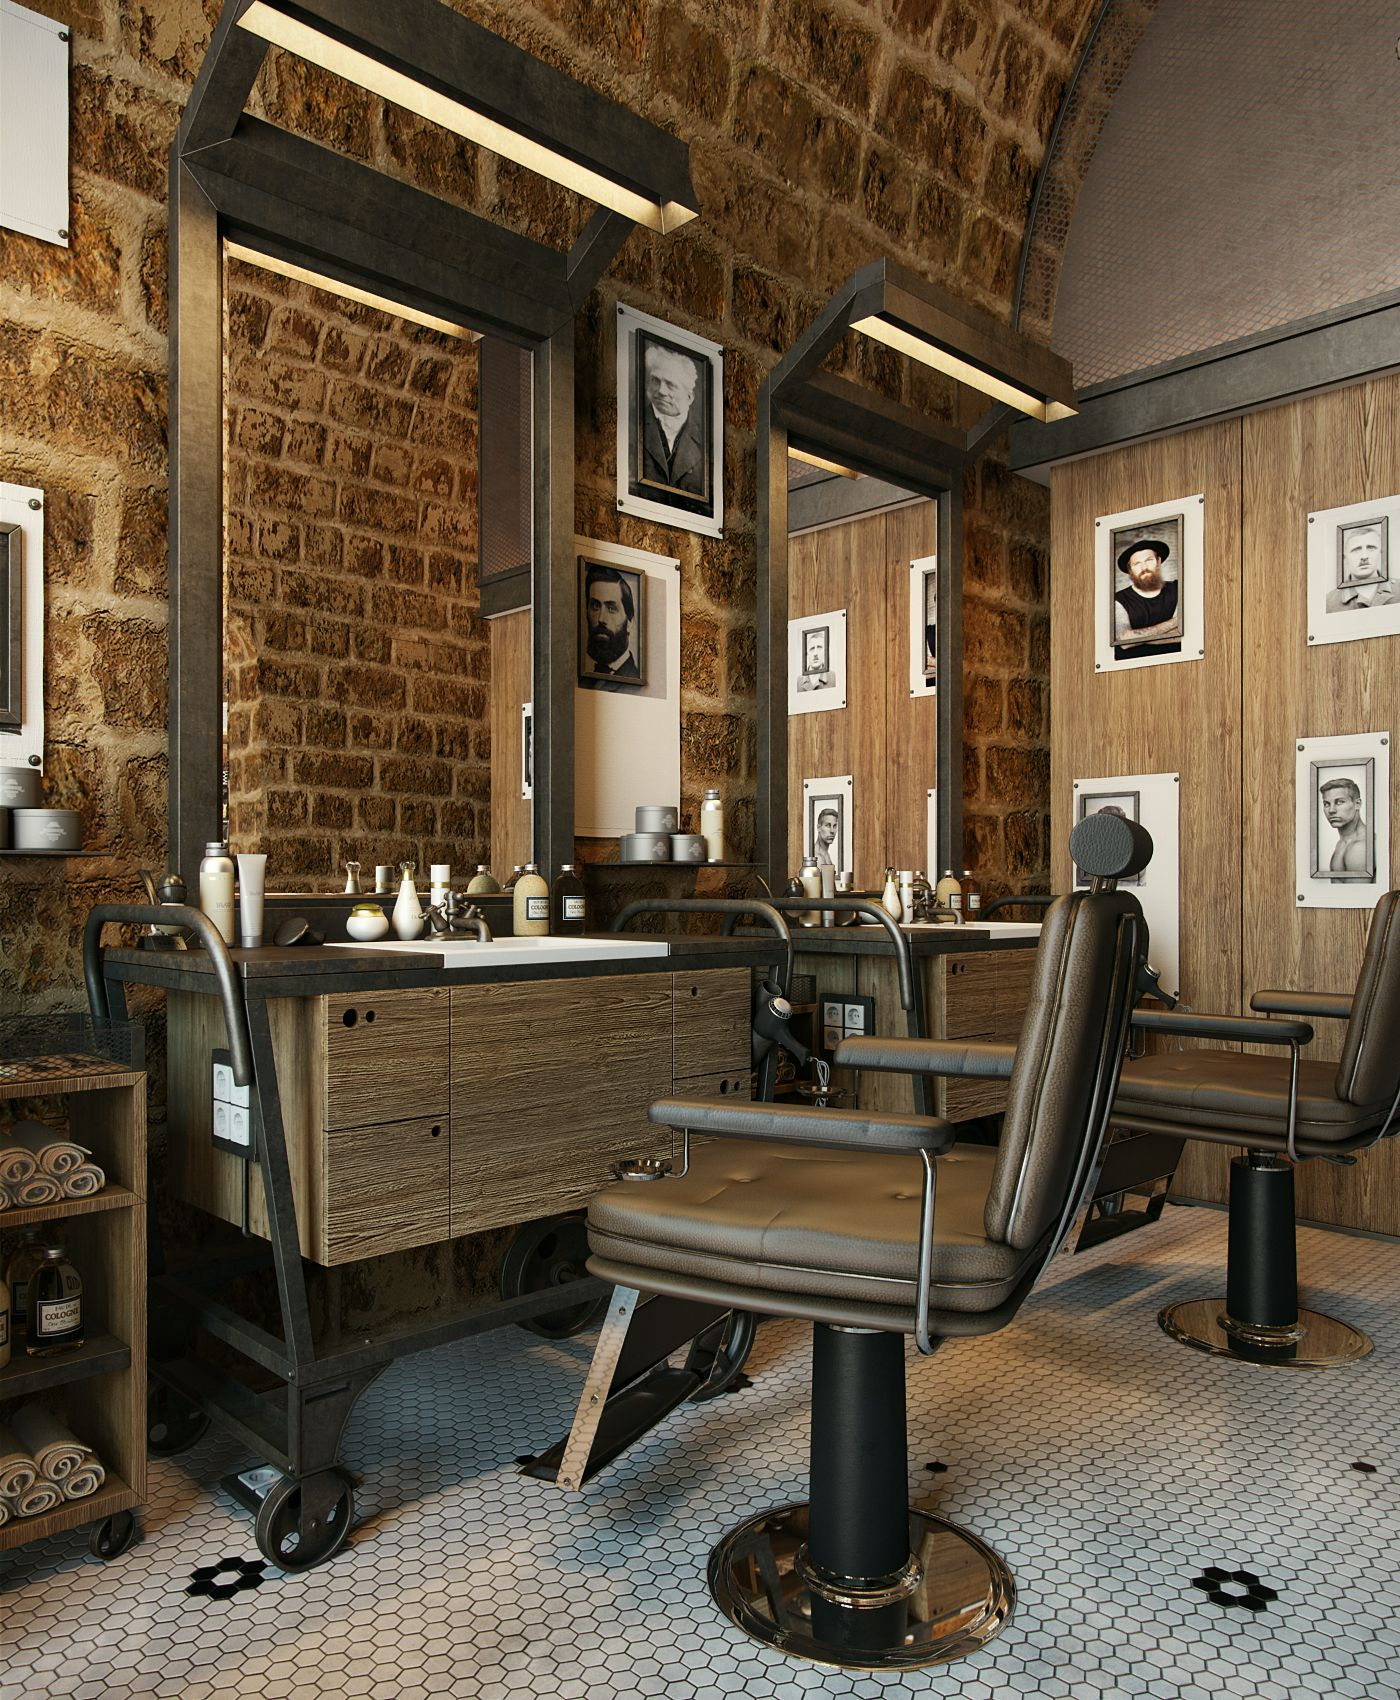 Phil  Joe4  architectural visualisation  Barbershop